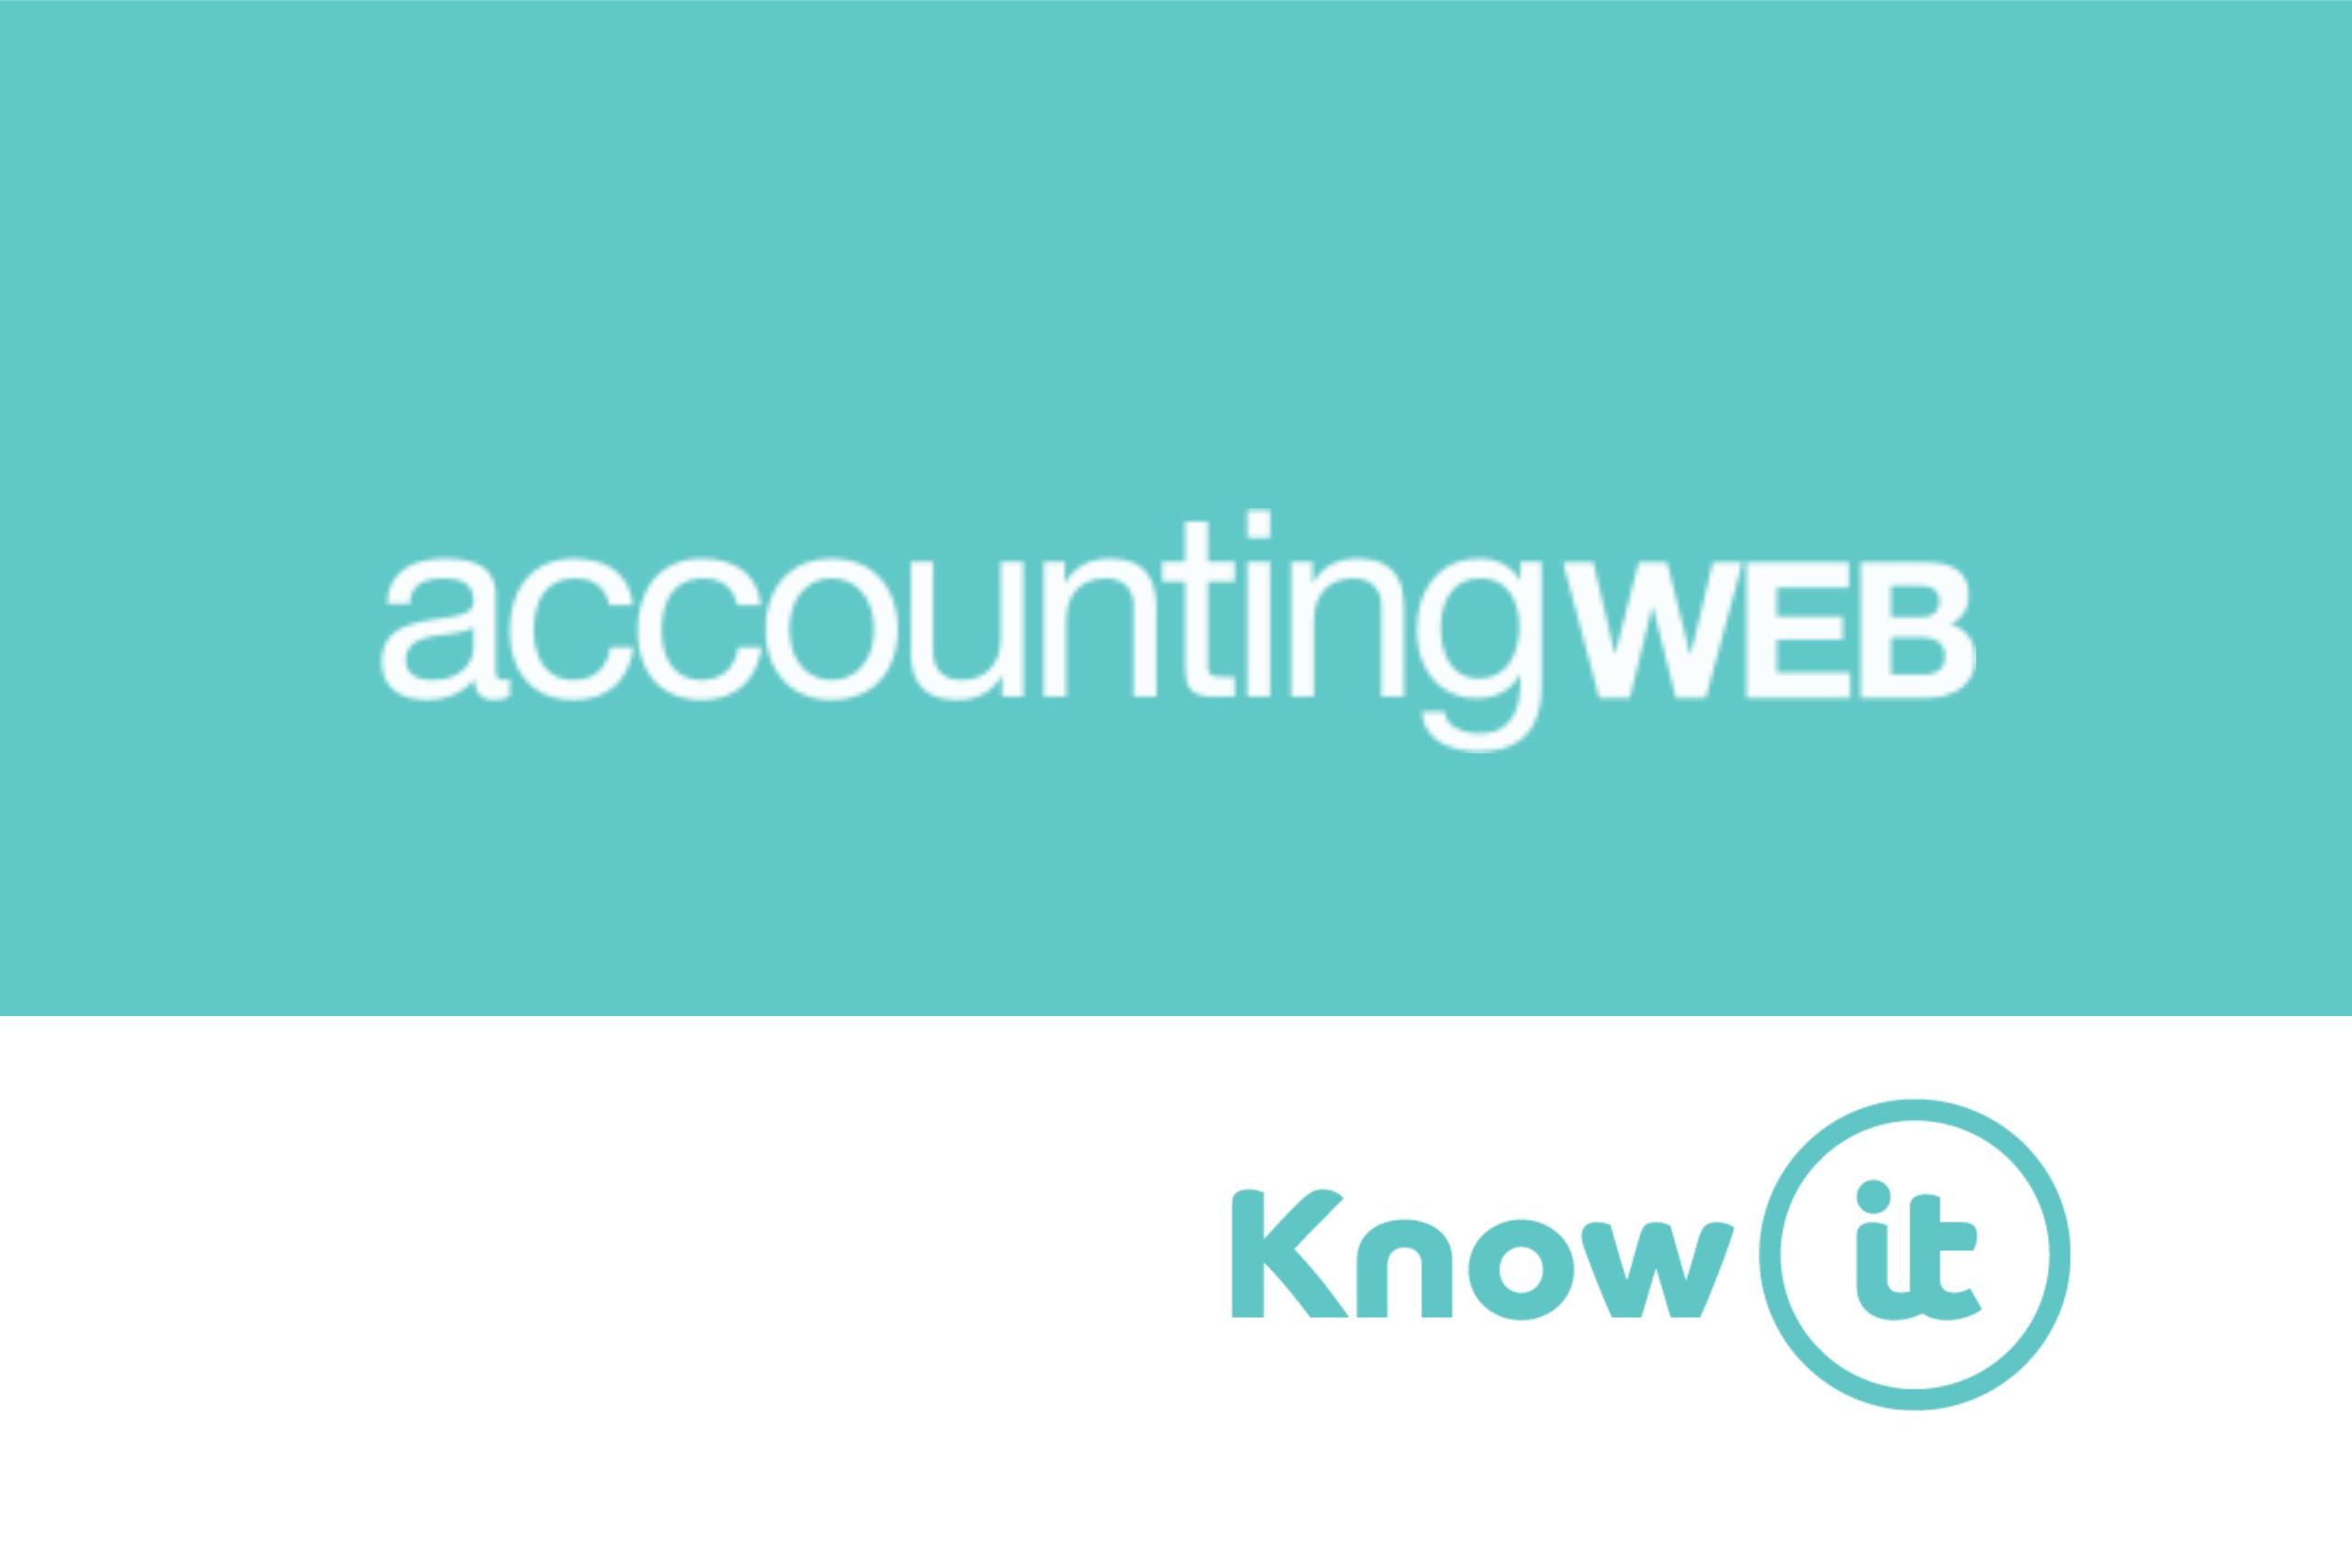 Know-it logo alongside Accountweb logo